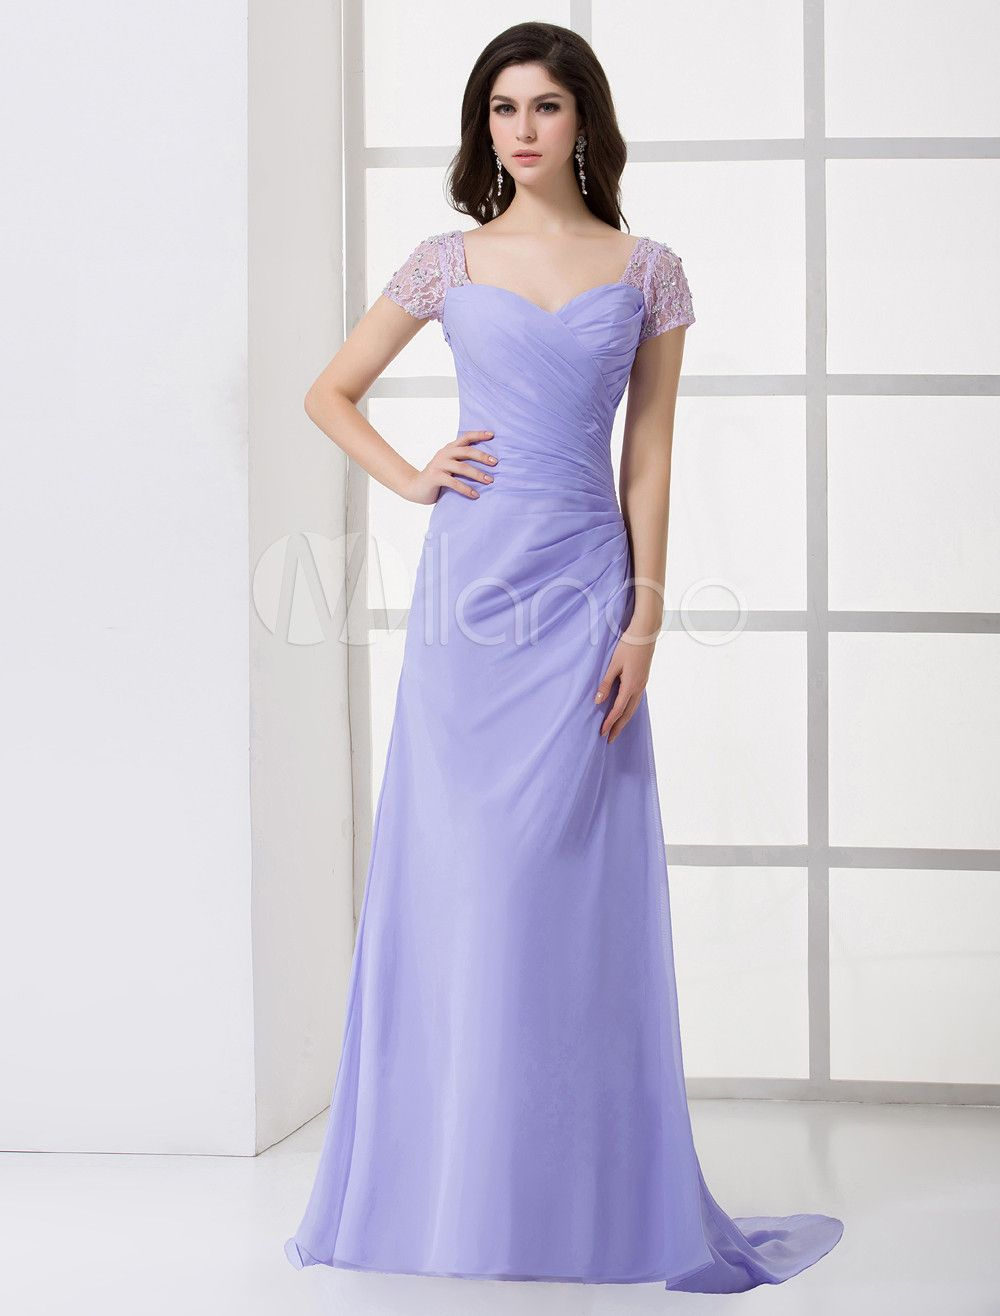 Milanoo ltd evening dresses glamorous lavender chiffon